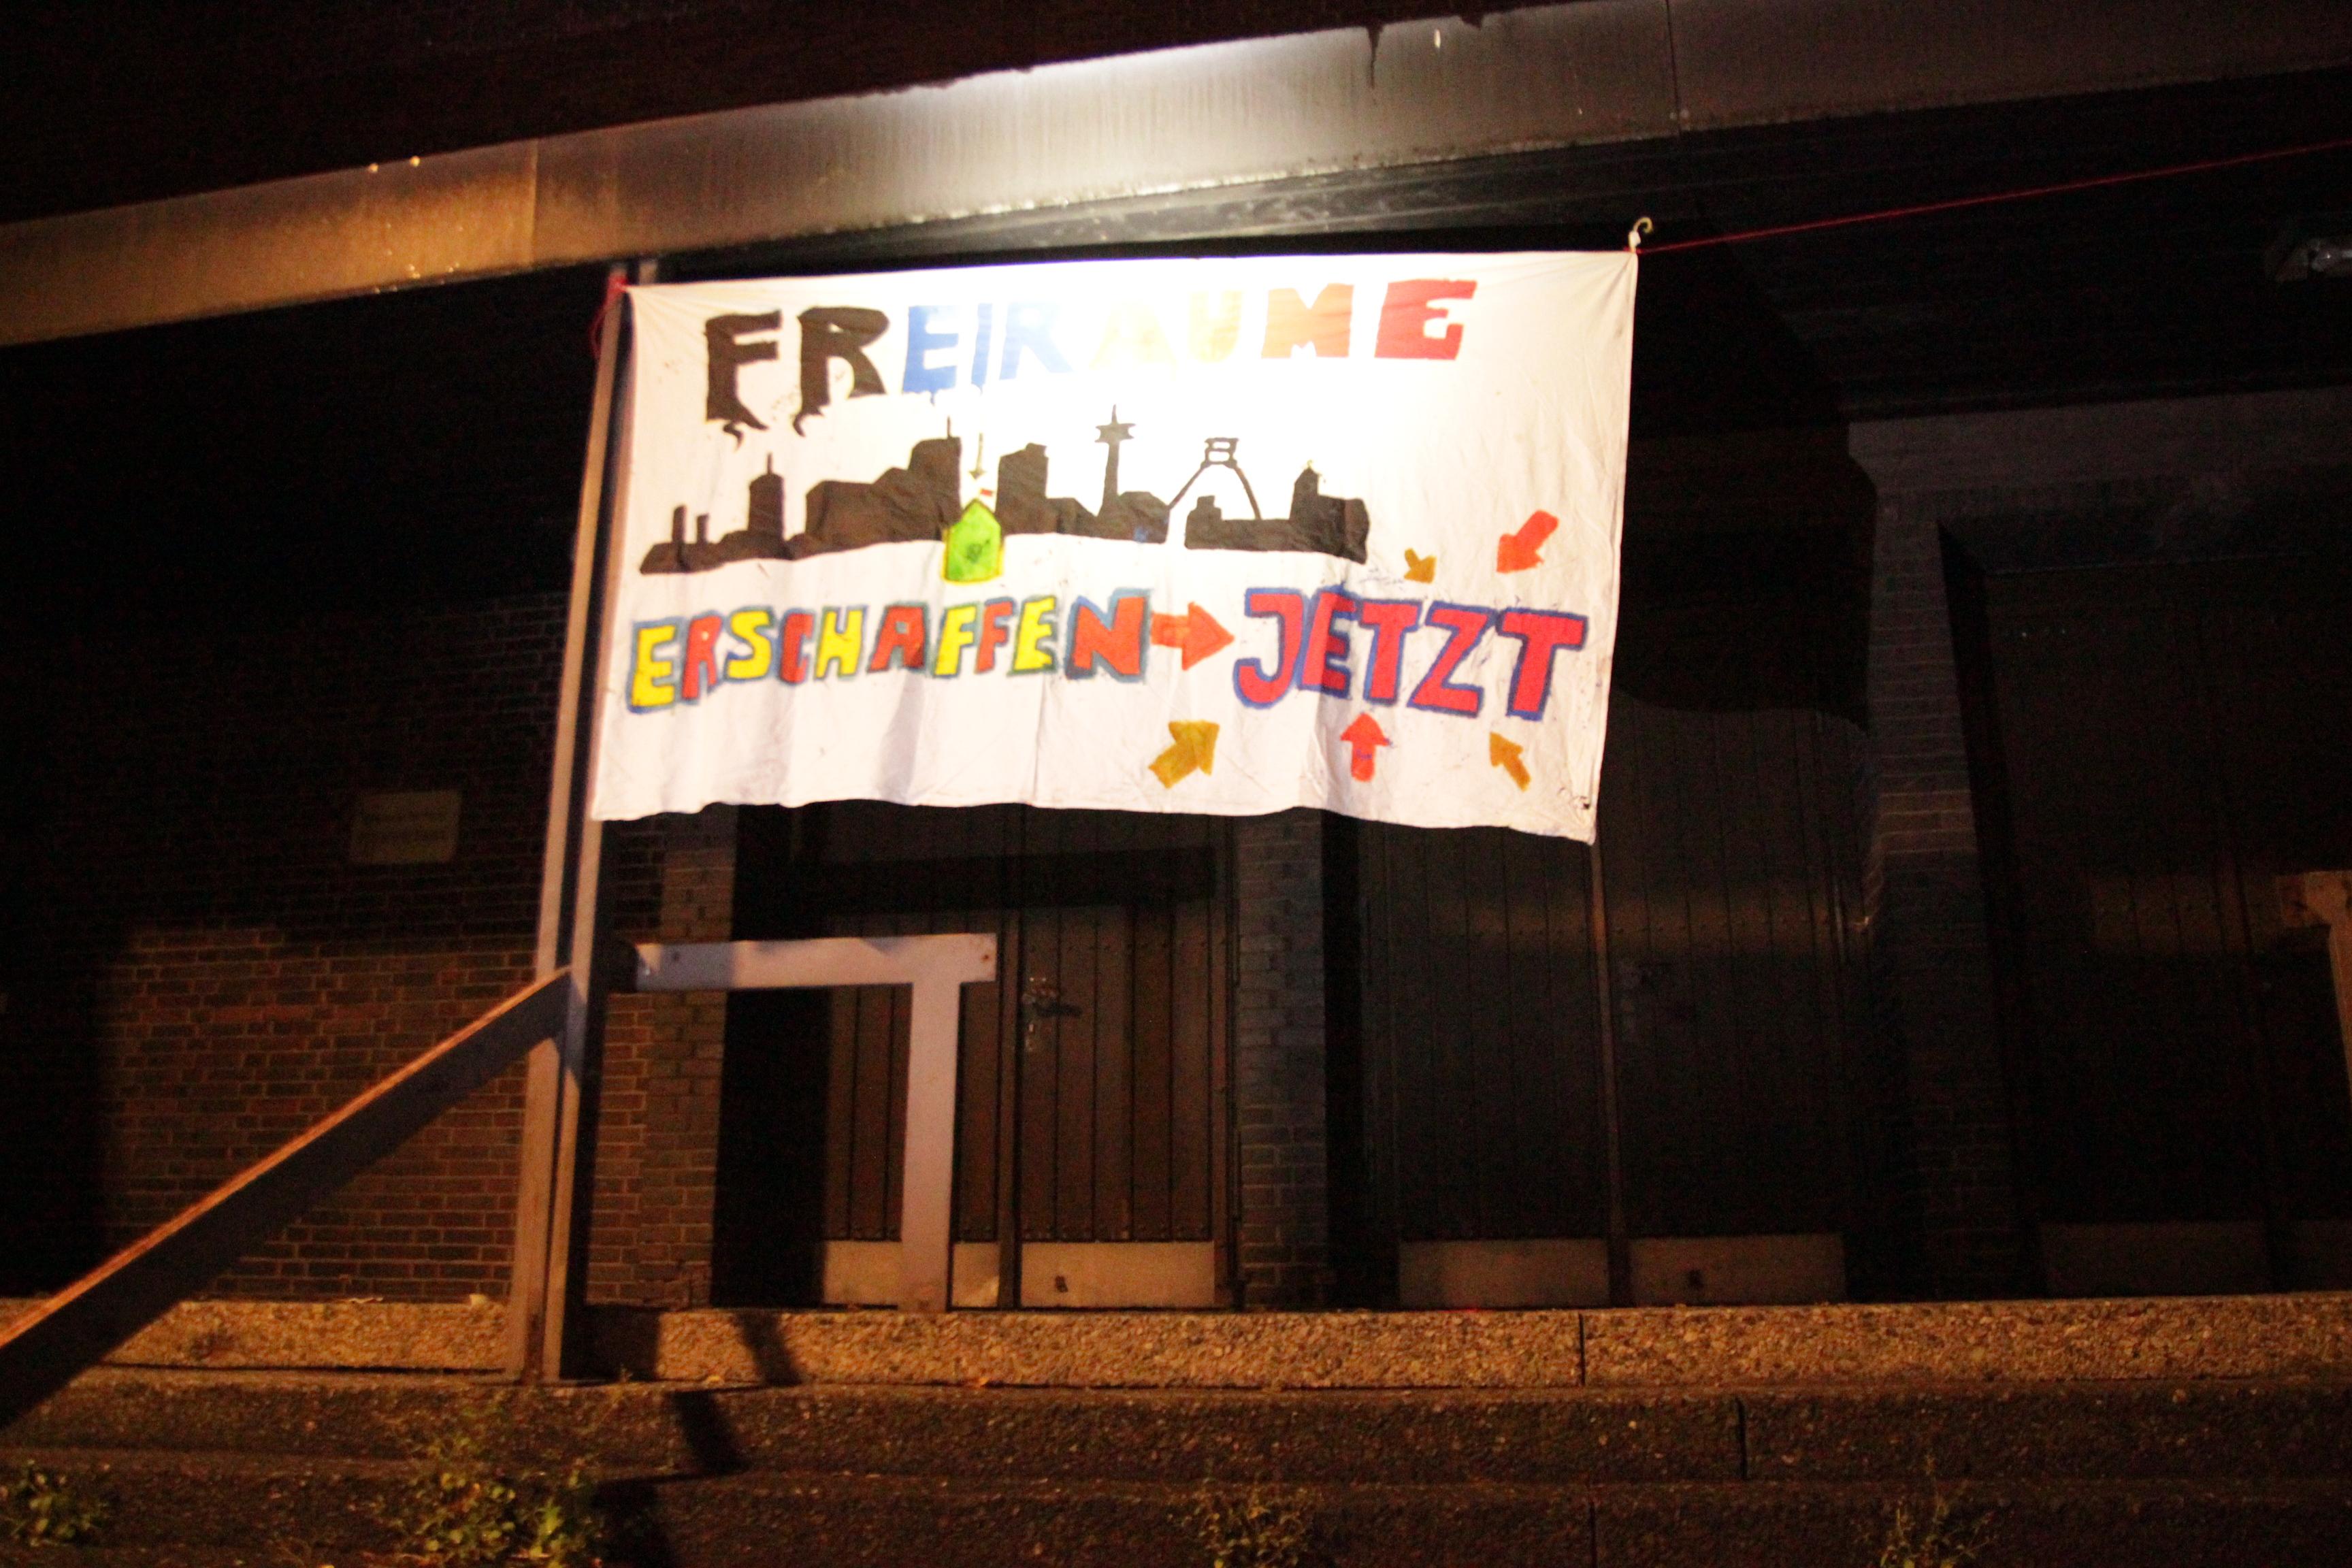 Banner am Gebäude: Freiräume erschaffen JETZT